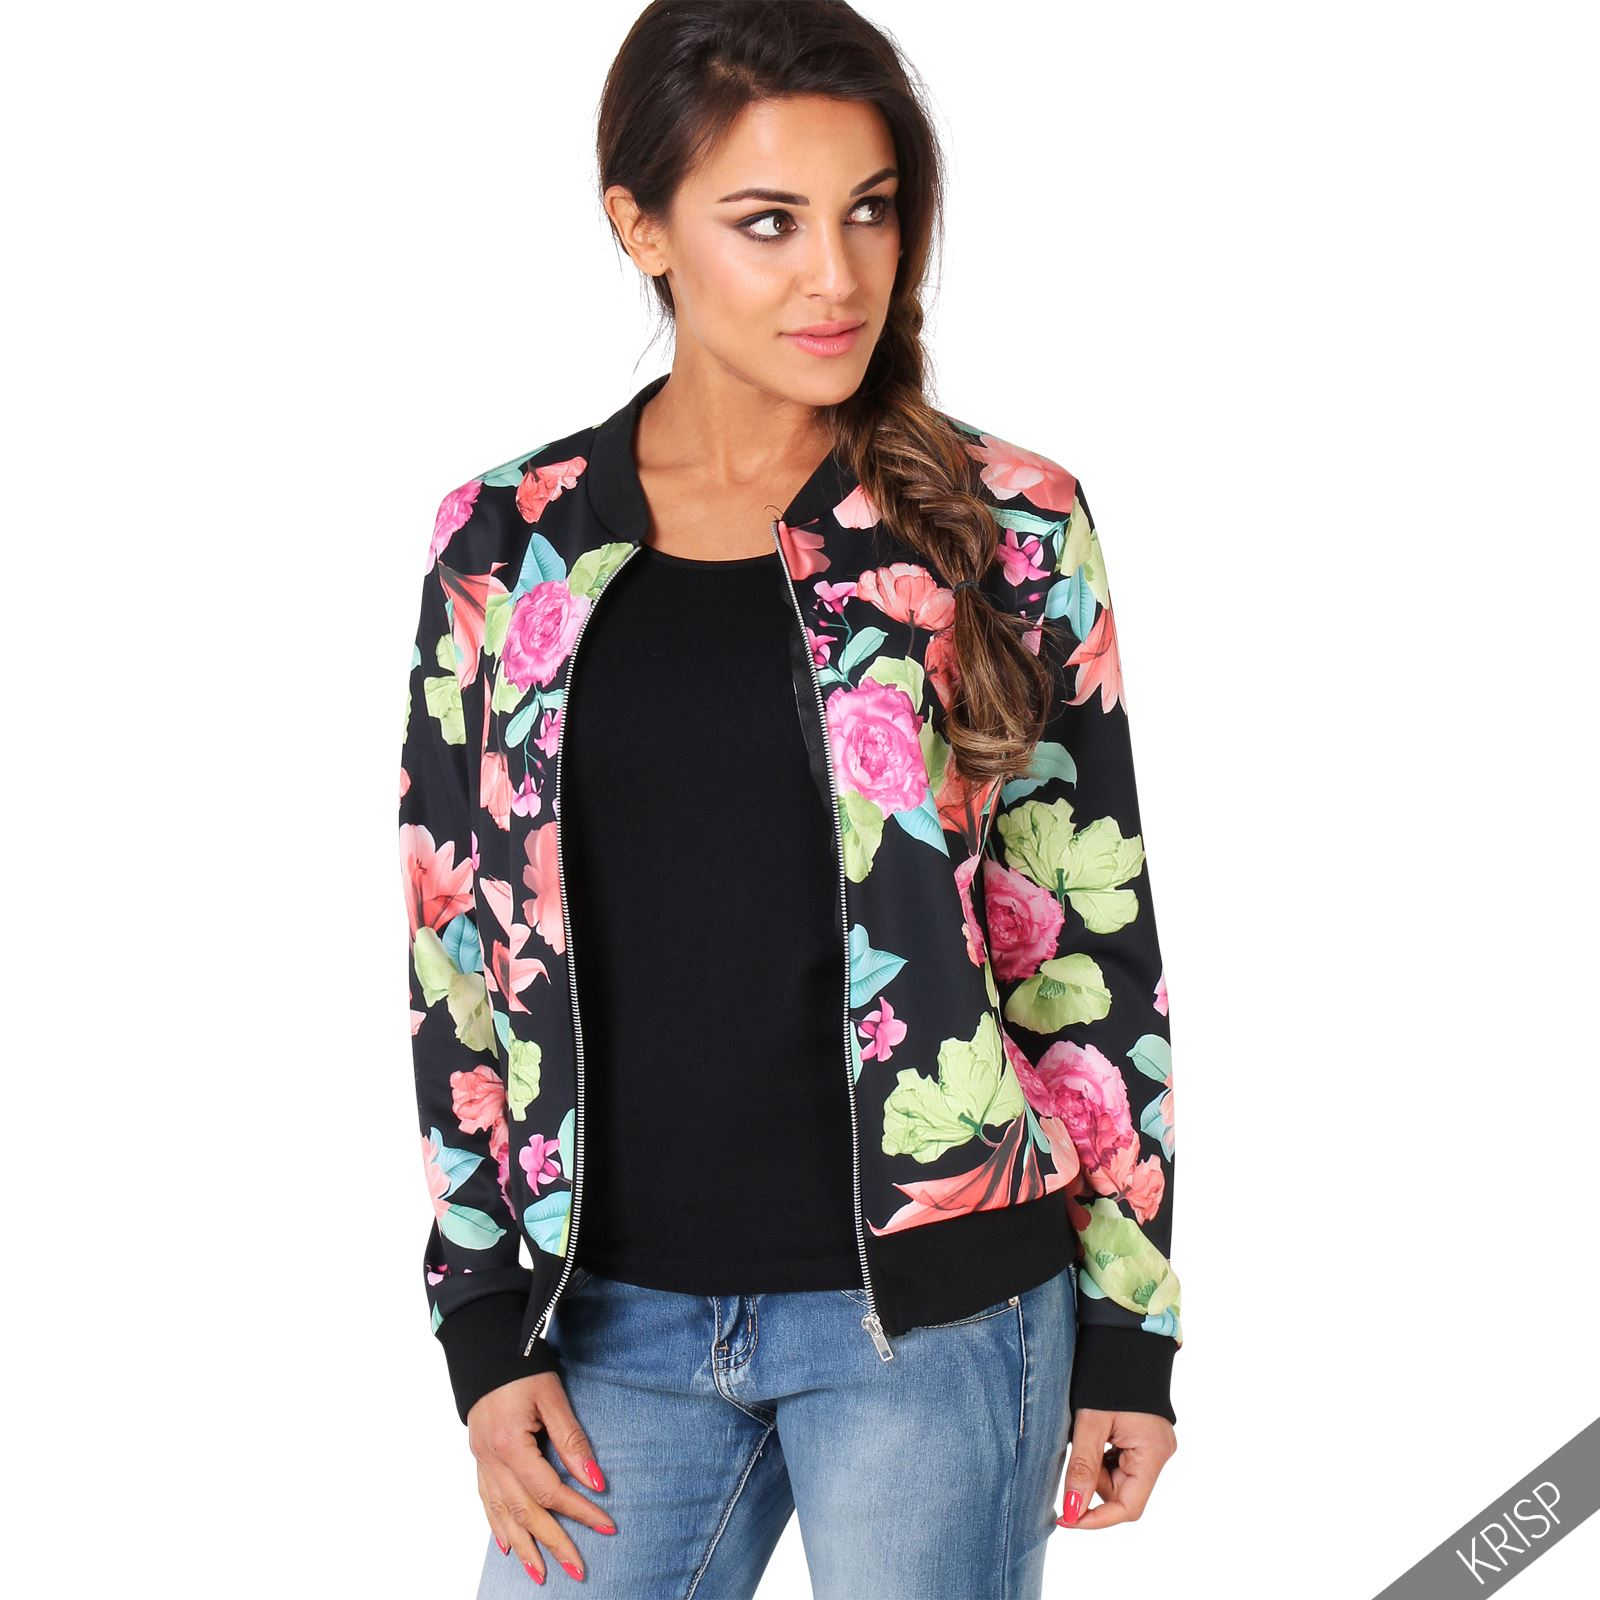 femme veste blouson l ger zipp bomber court fleuri manteau court s l ebay. Black Bedroom Furniture Sets. Home Design Ideas